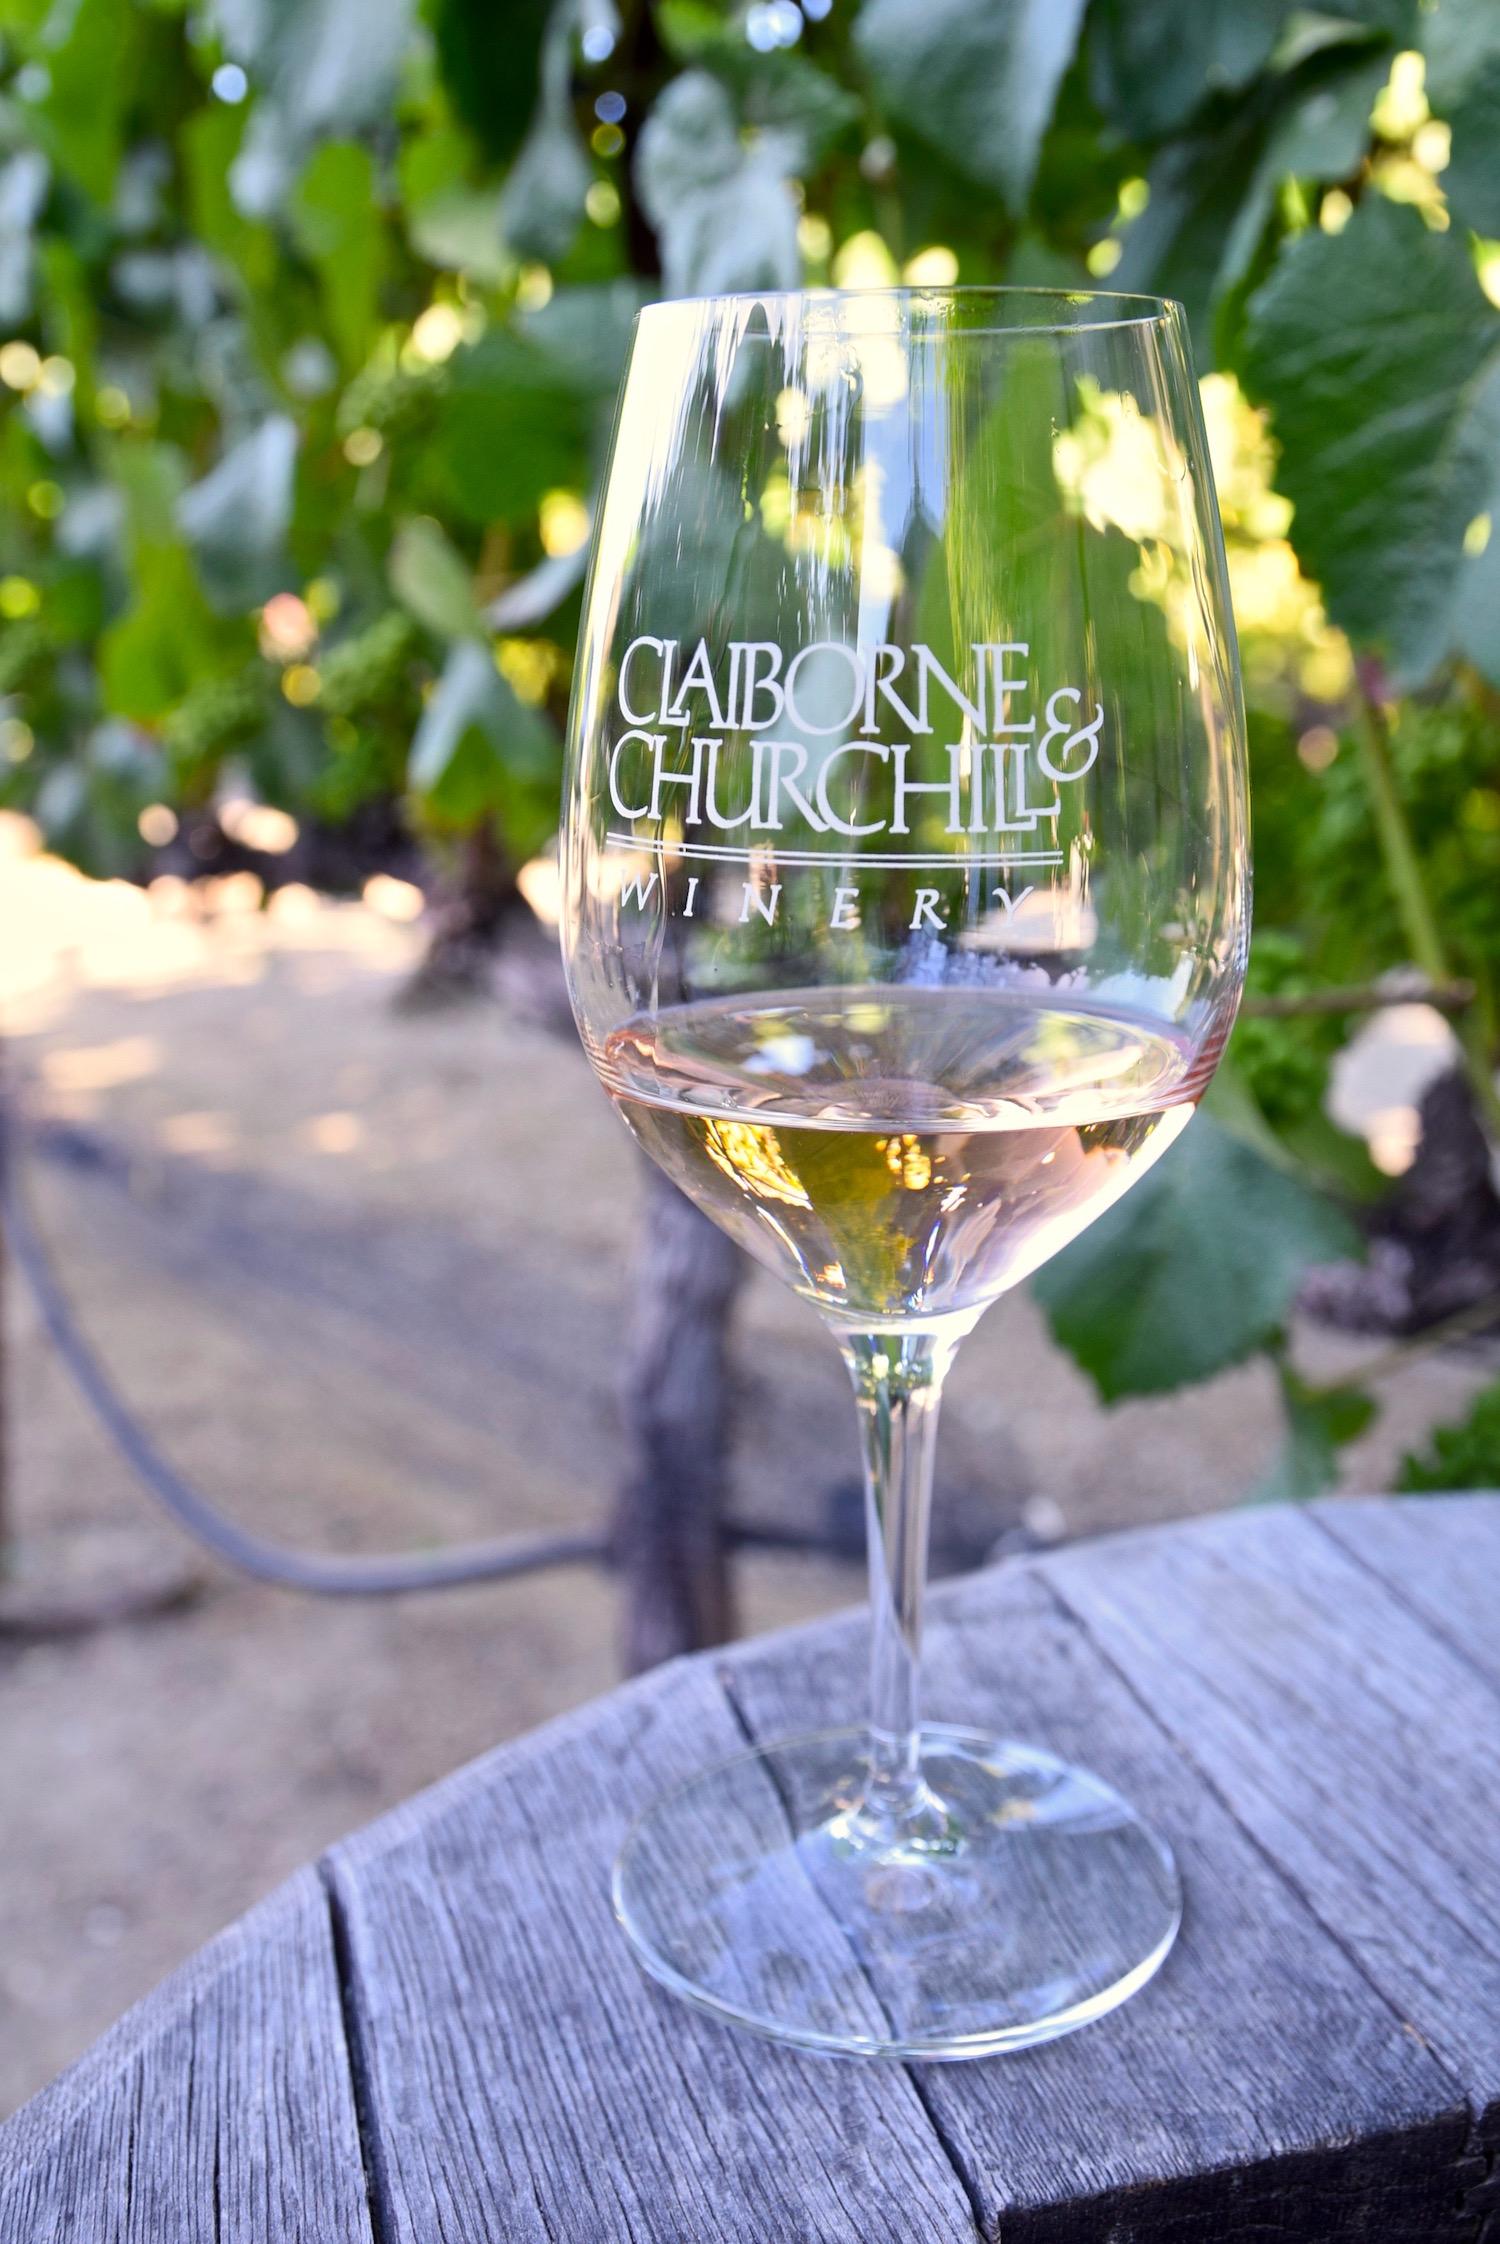 Clairborne & Churchill Wine.jpg